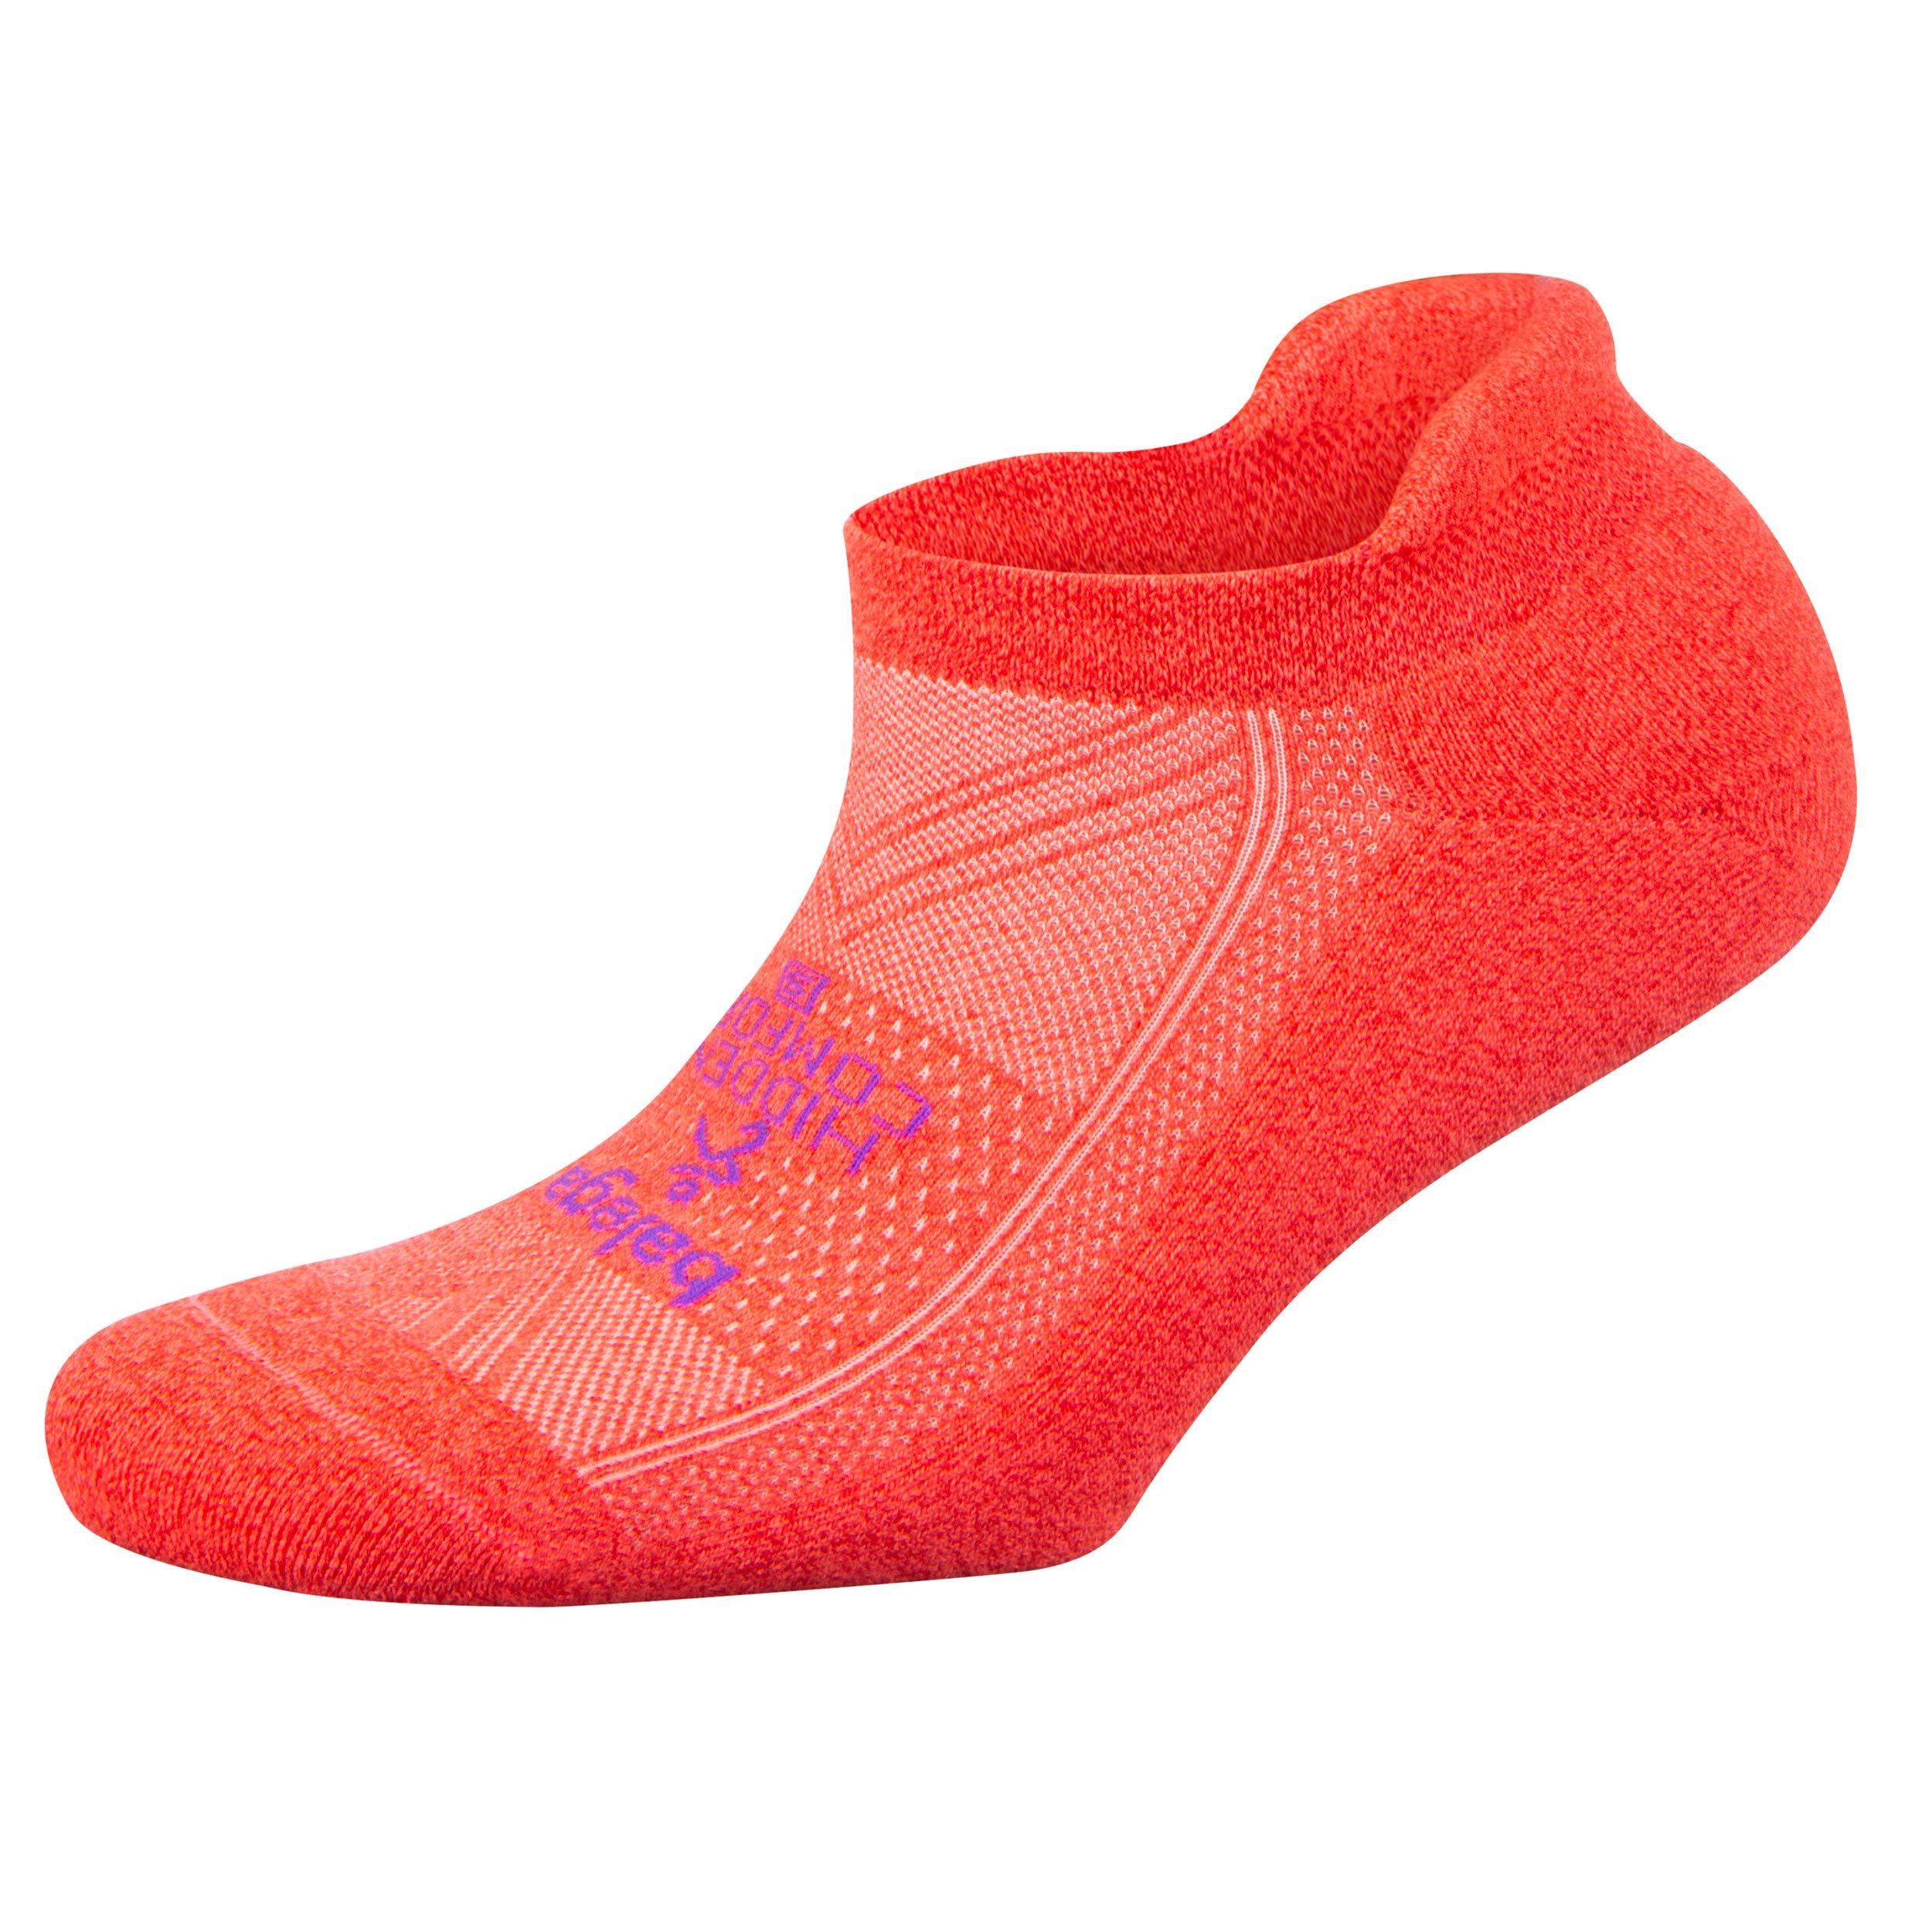 Balega Hidden Comfort No-Show Running Socks for Men and Women (1 Pair), Cherry, Small